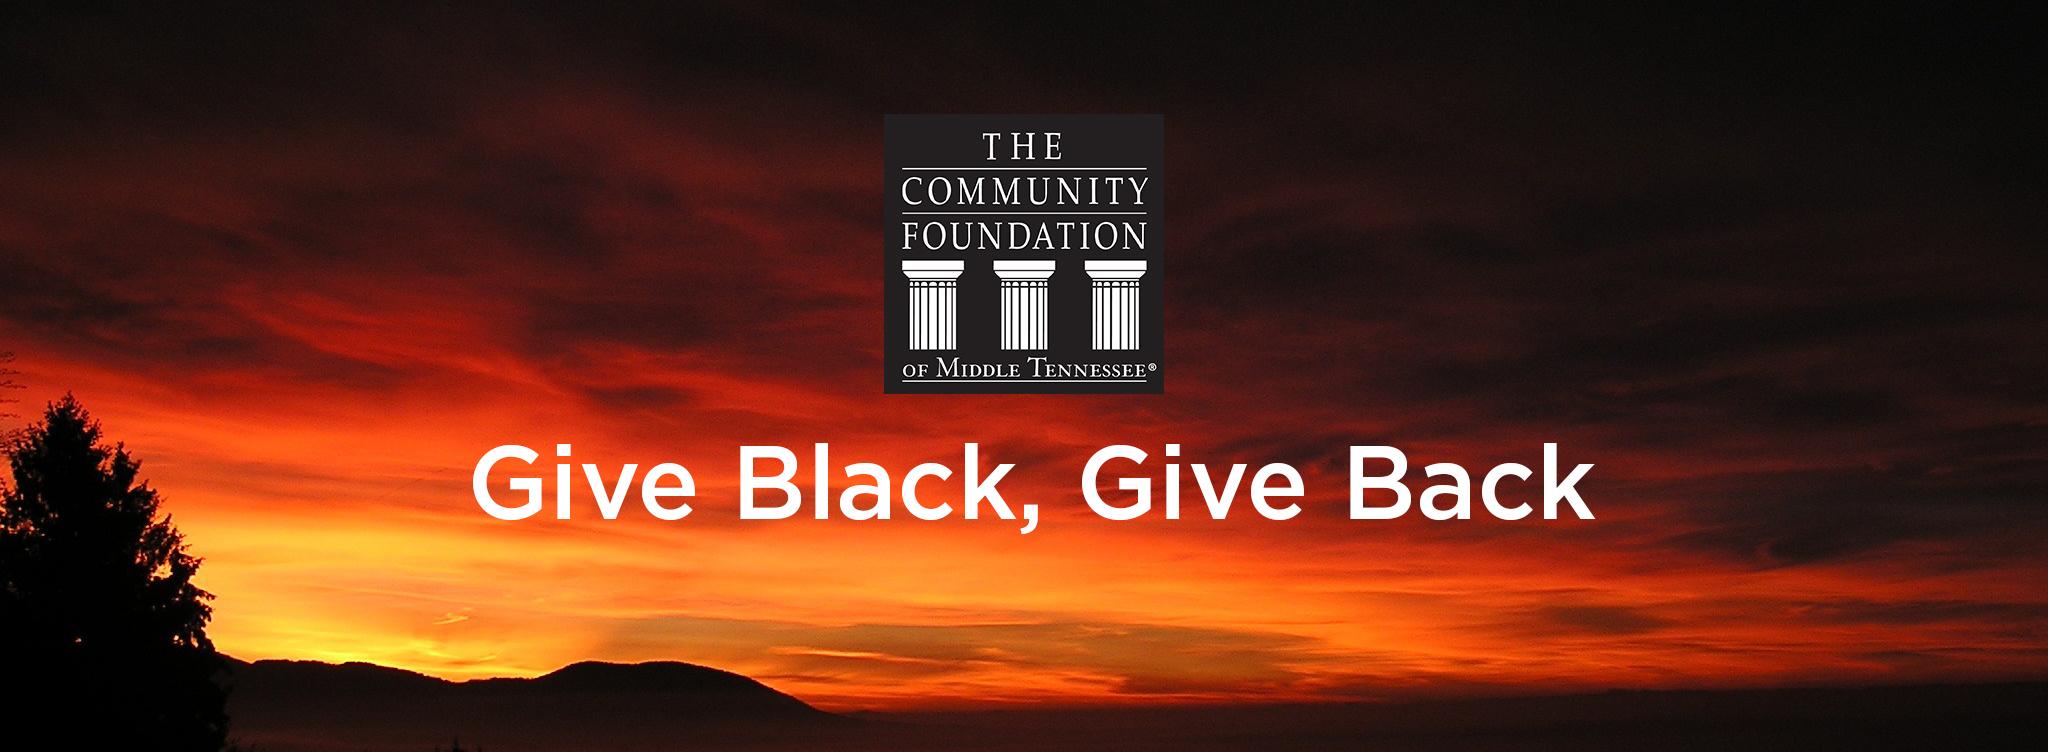 Give Black Give Back